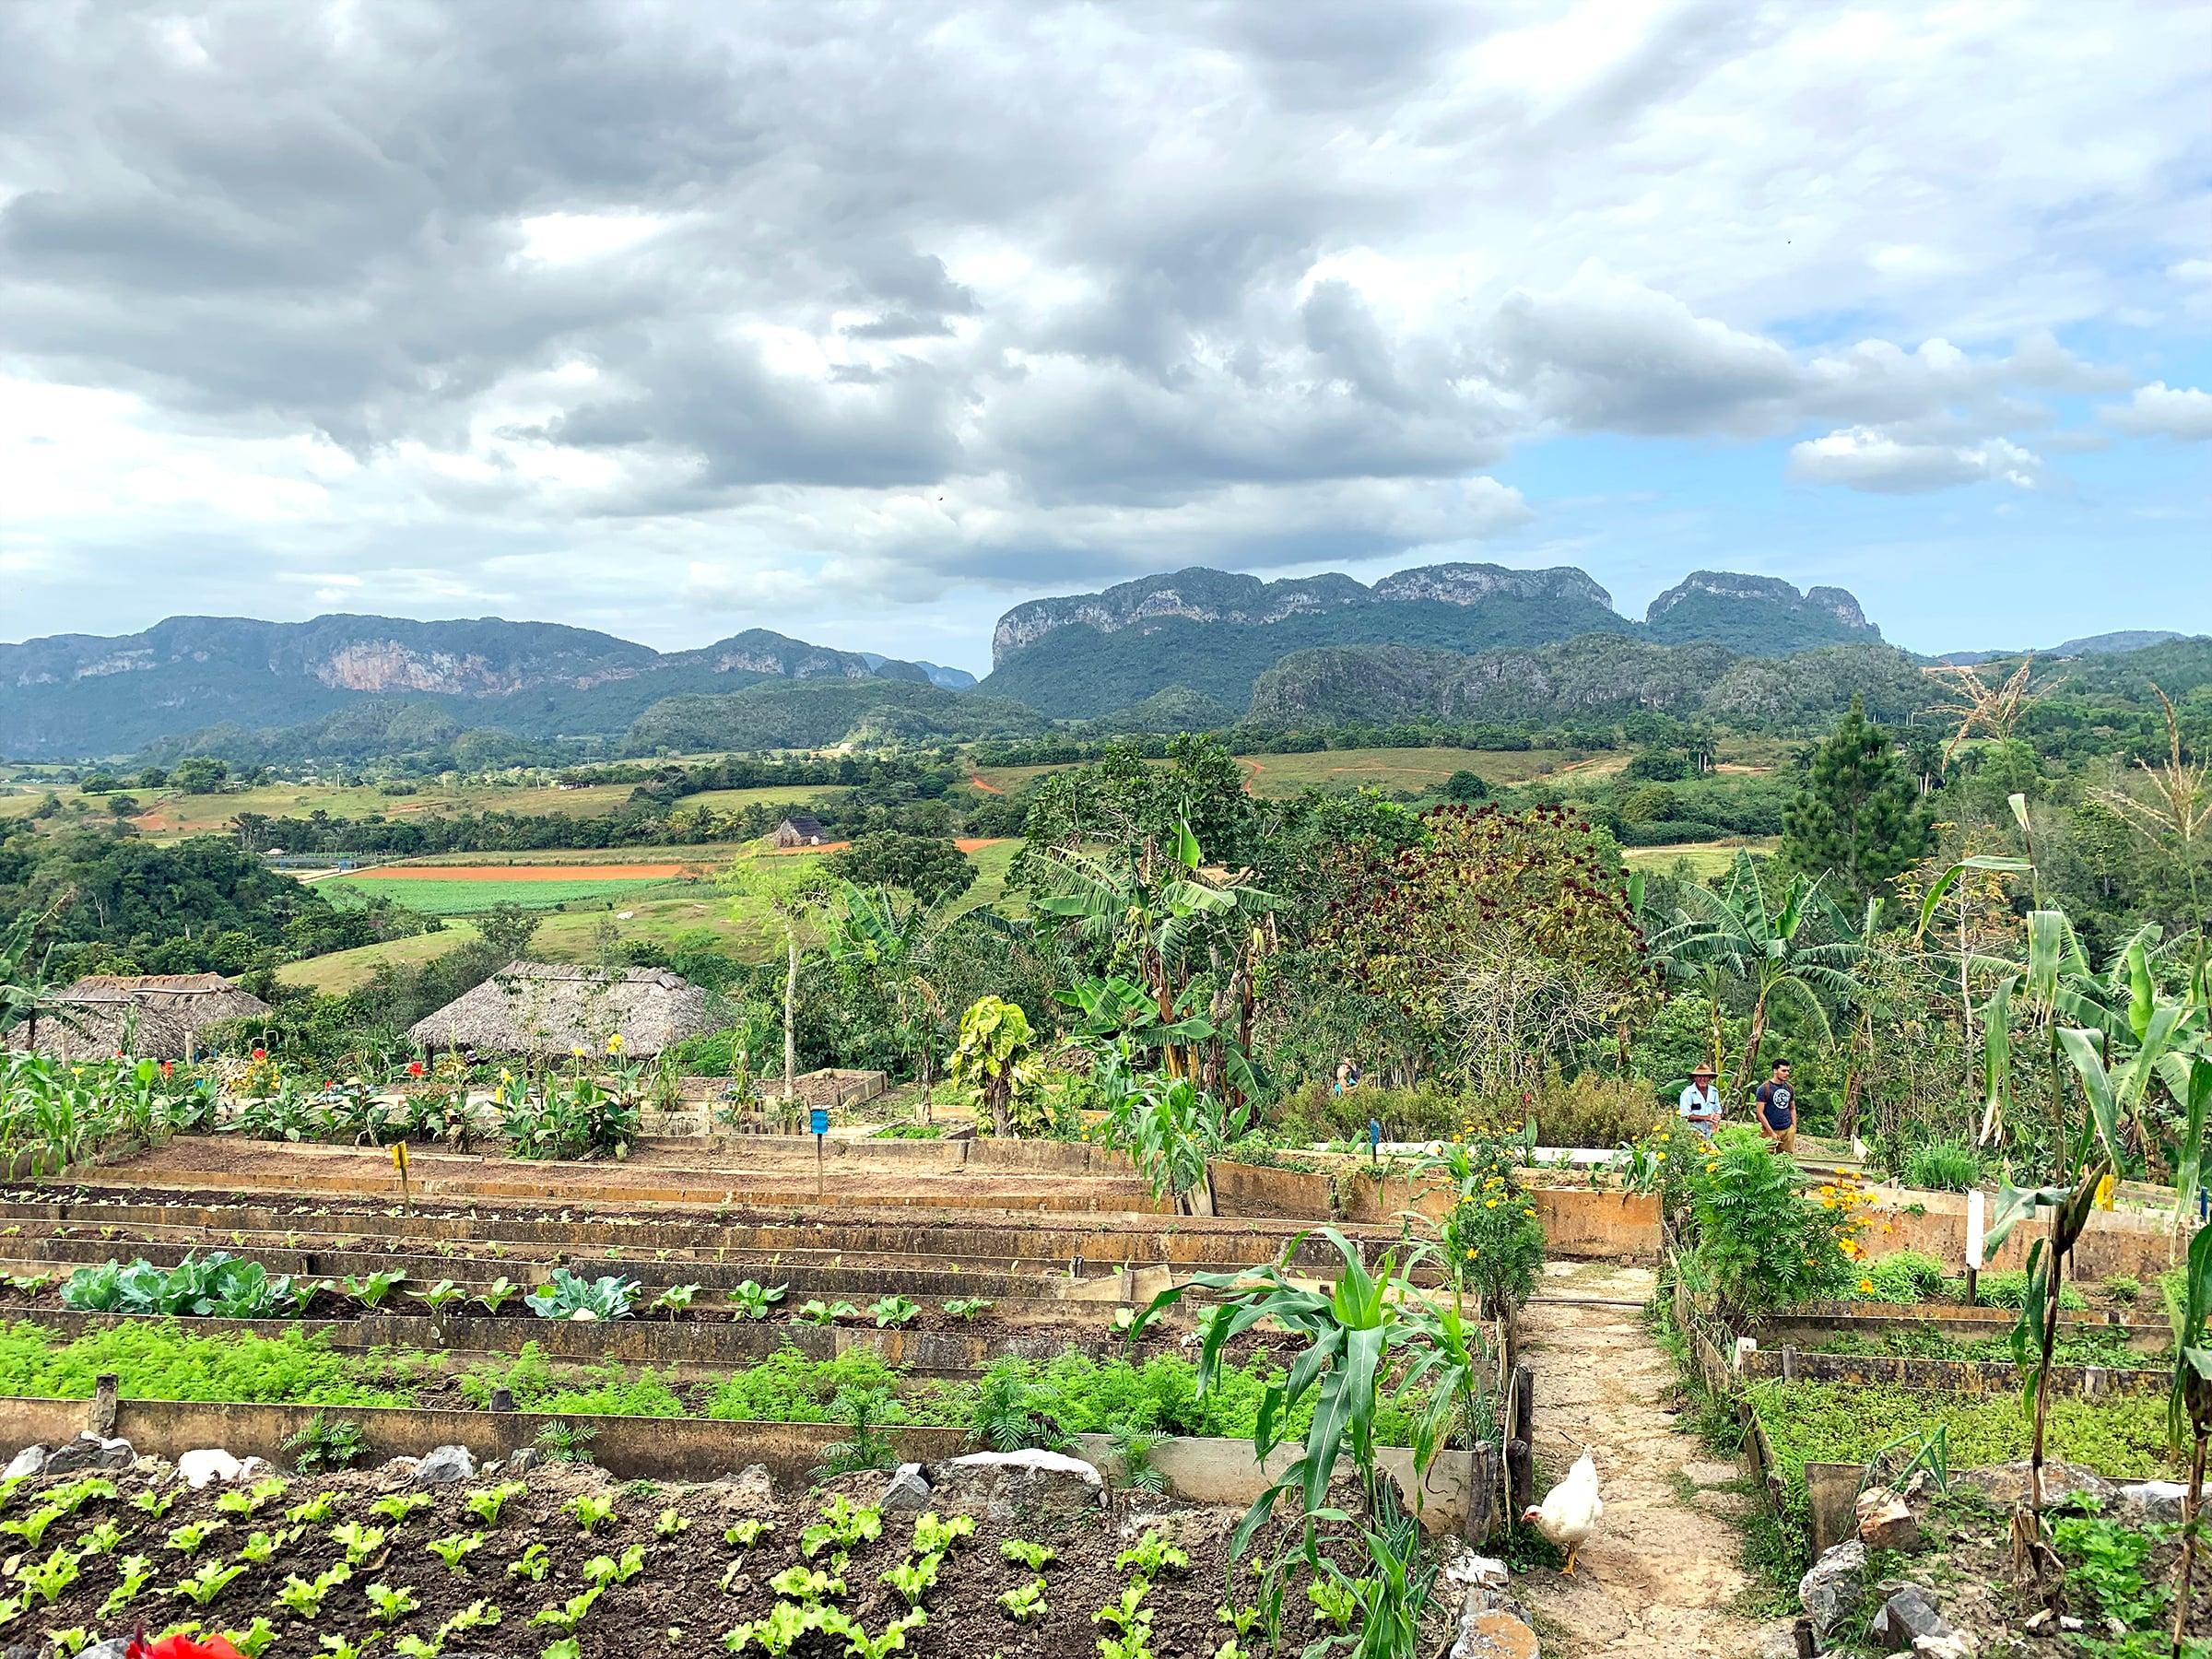 Farm landscape seen right outside of a restaurant in Vinales, Cuba